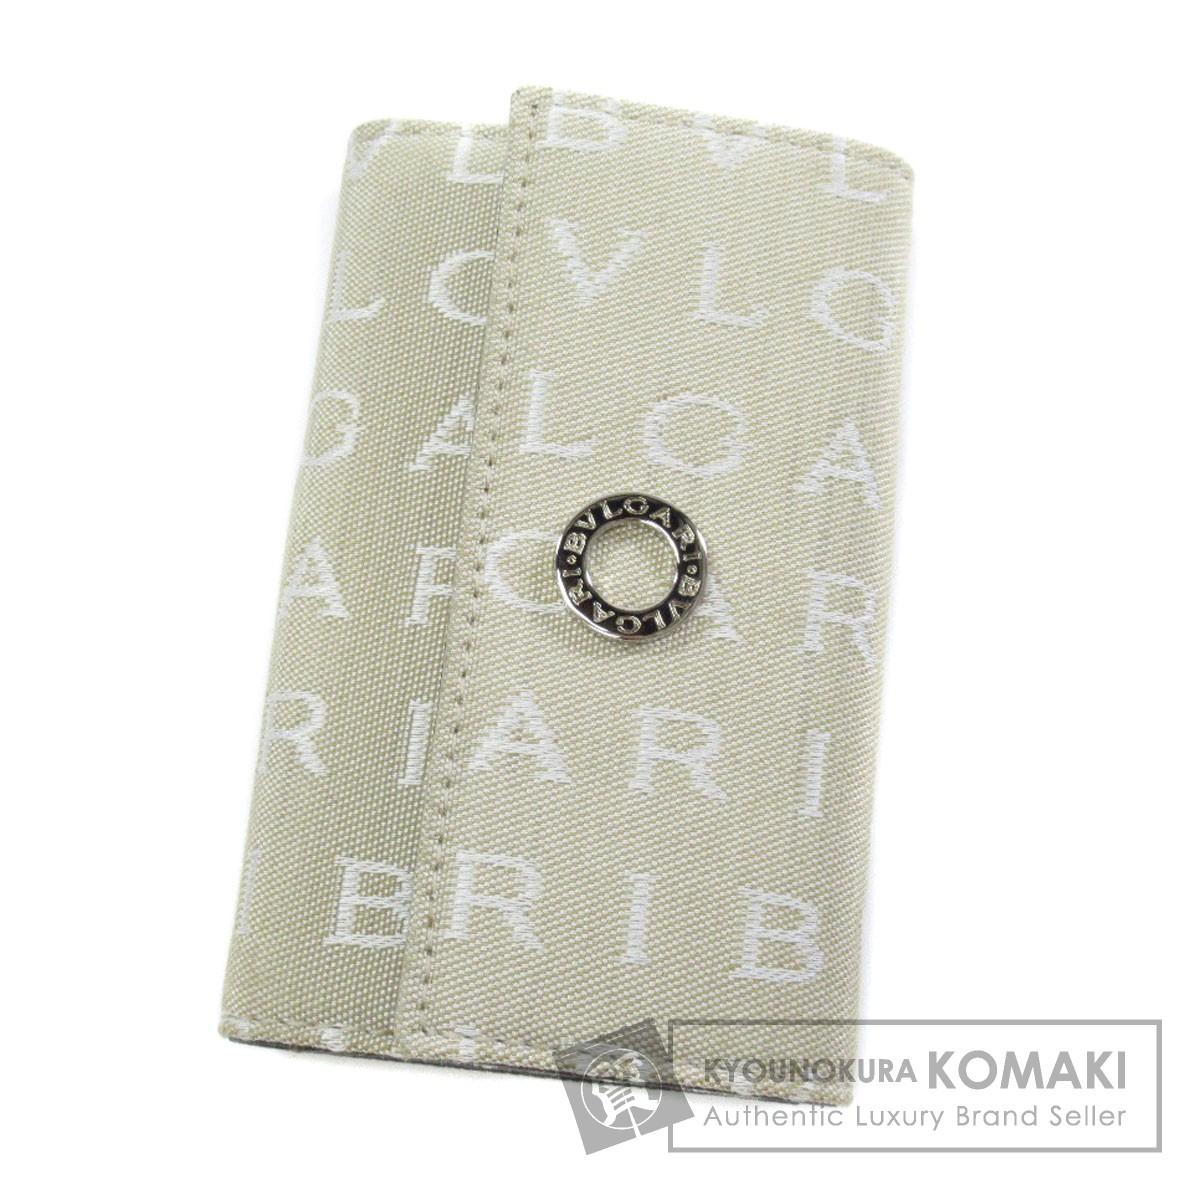 382ae4a87d Kyonokura Komaki Brand Cheapest Challenger: Authentic BVLGARI Logo ...